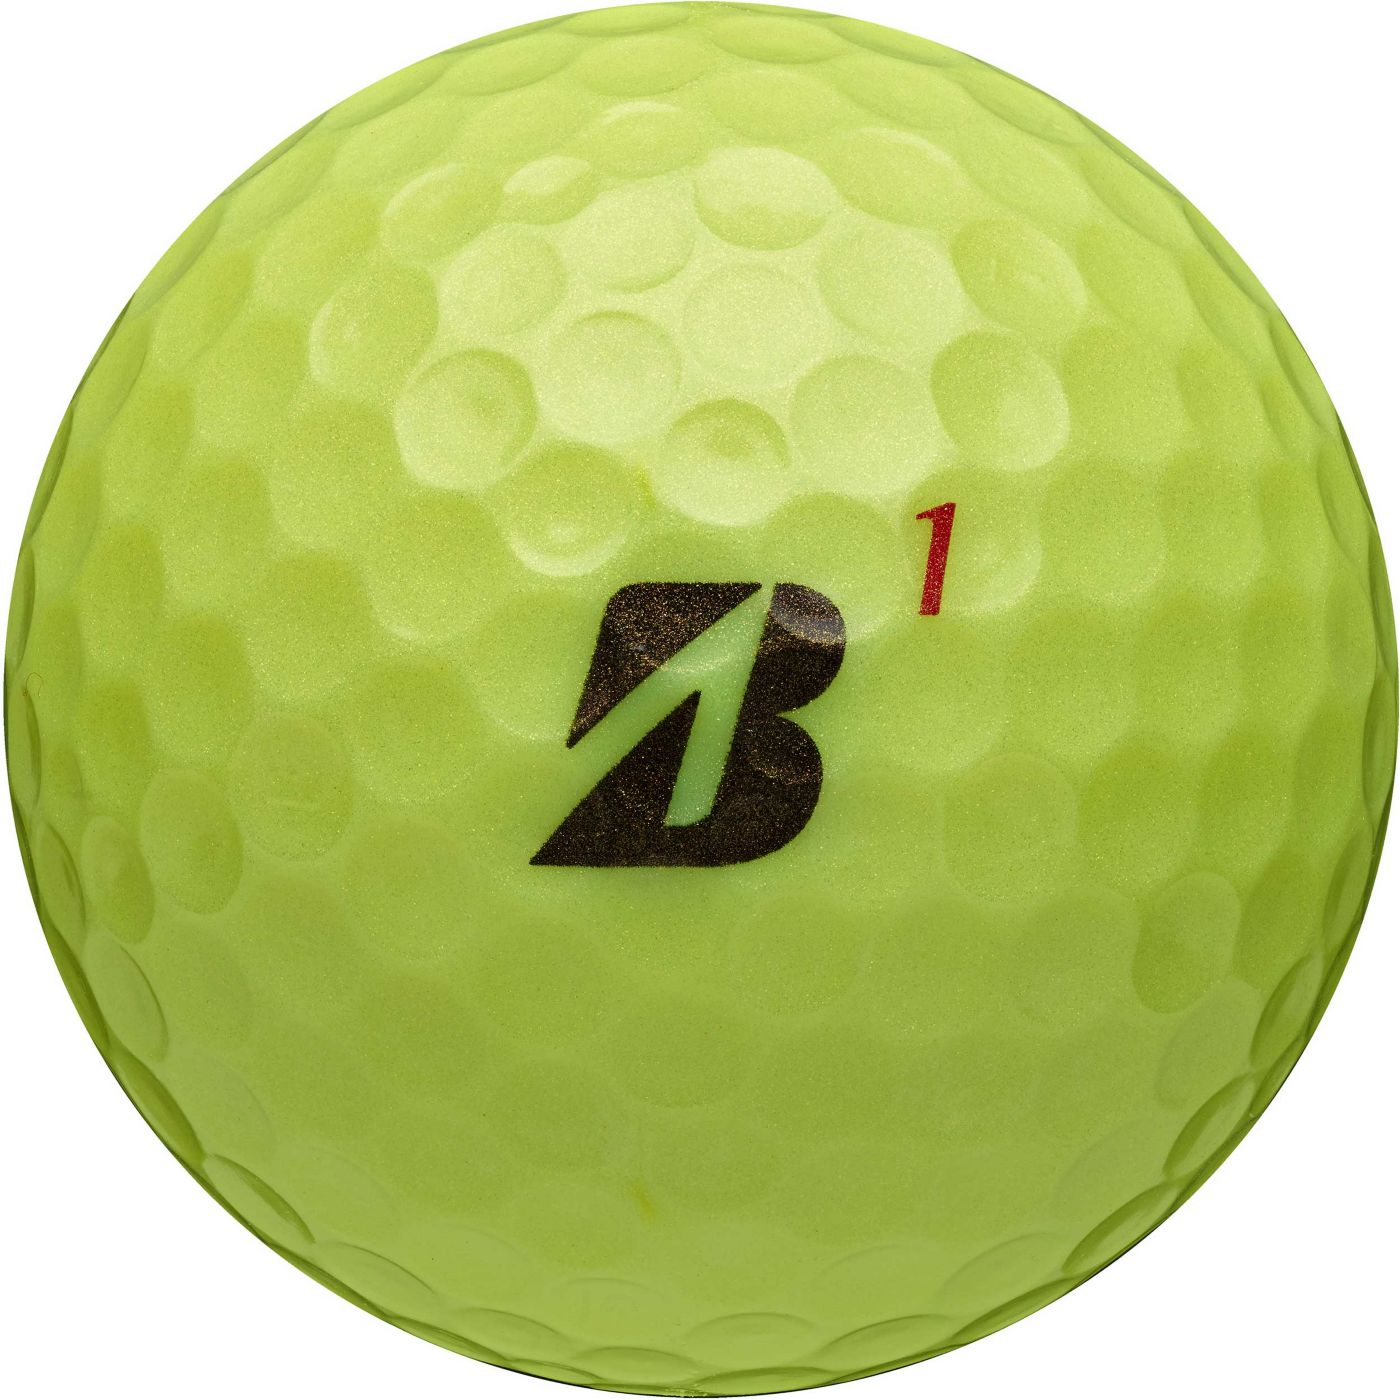 Bridgestone TOUR B RX Optic Yellow Golf Balls